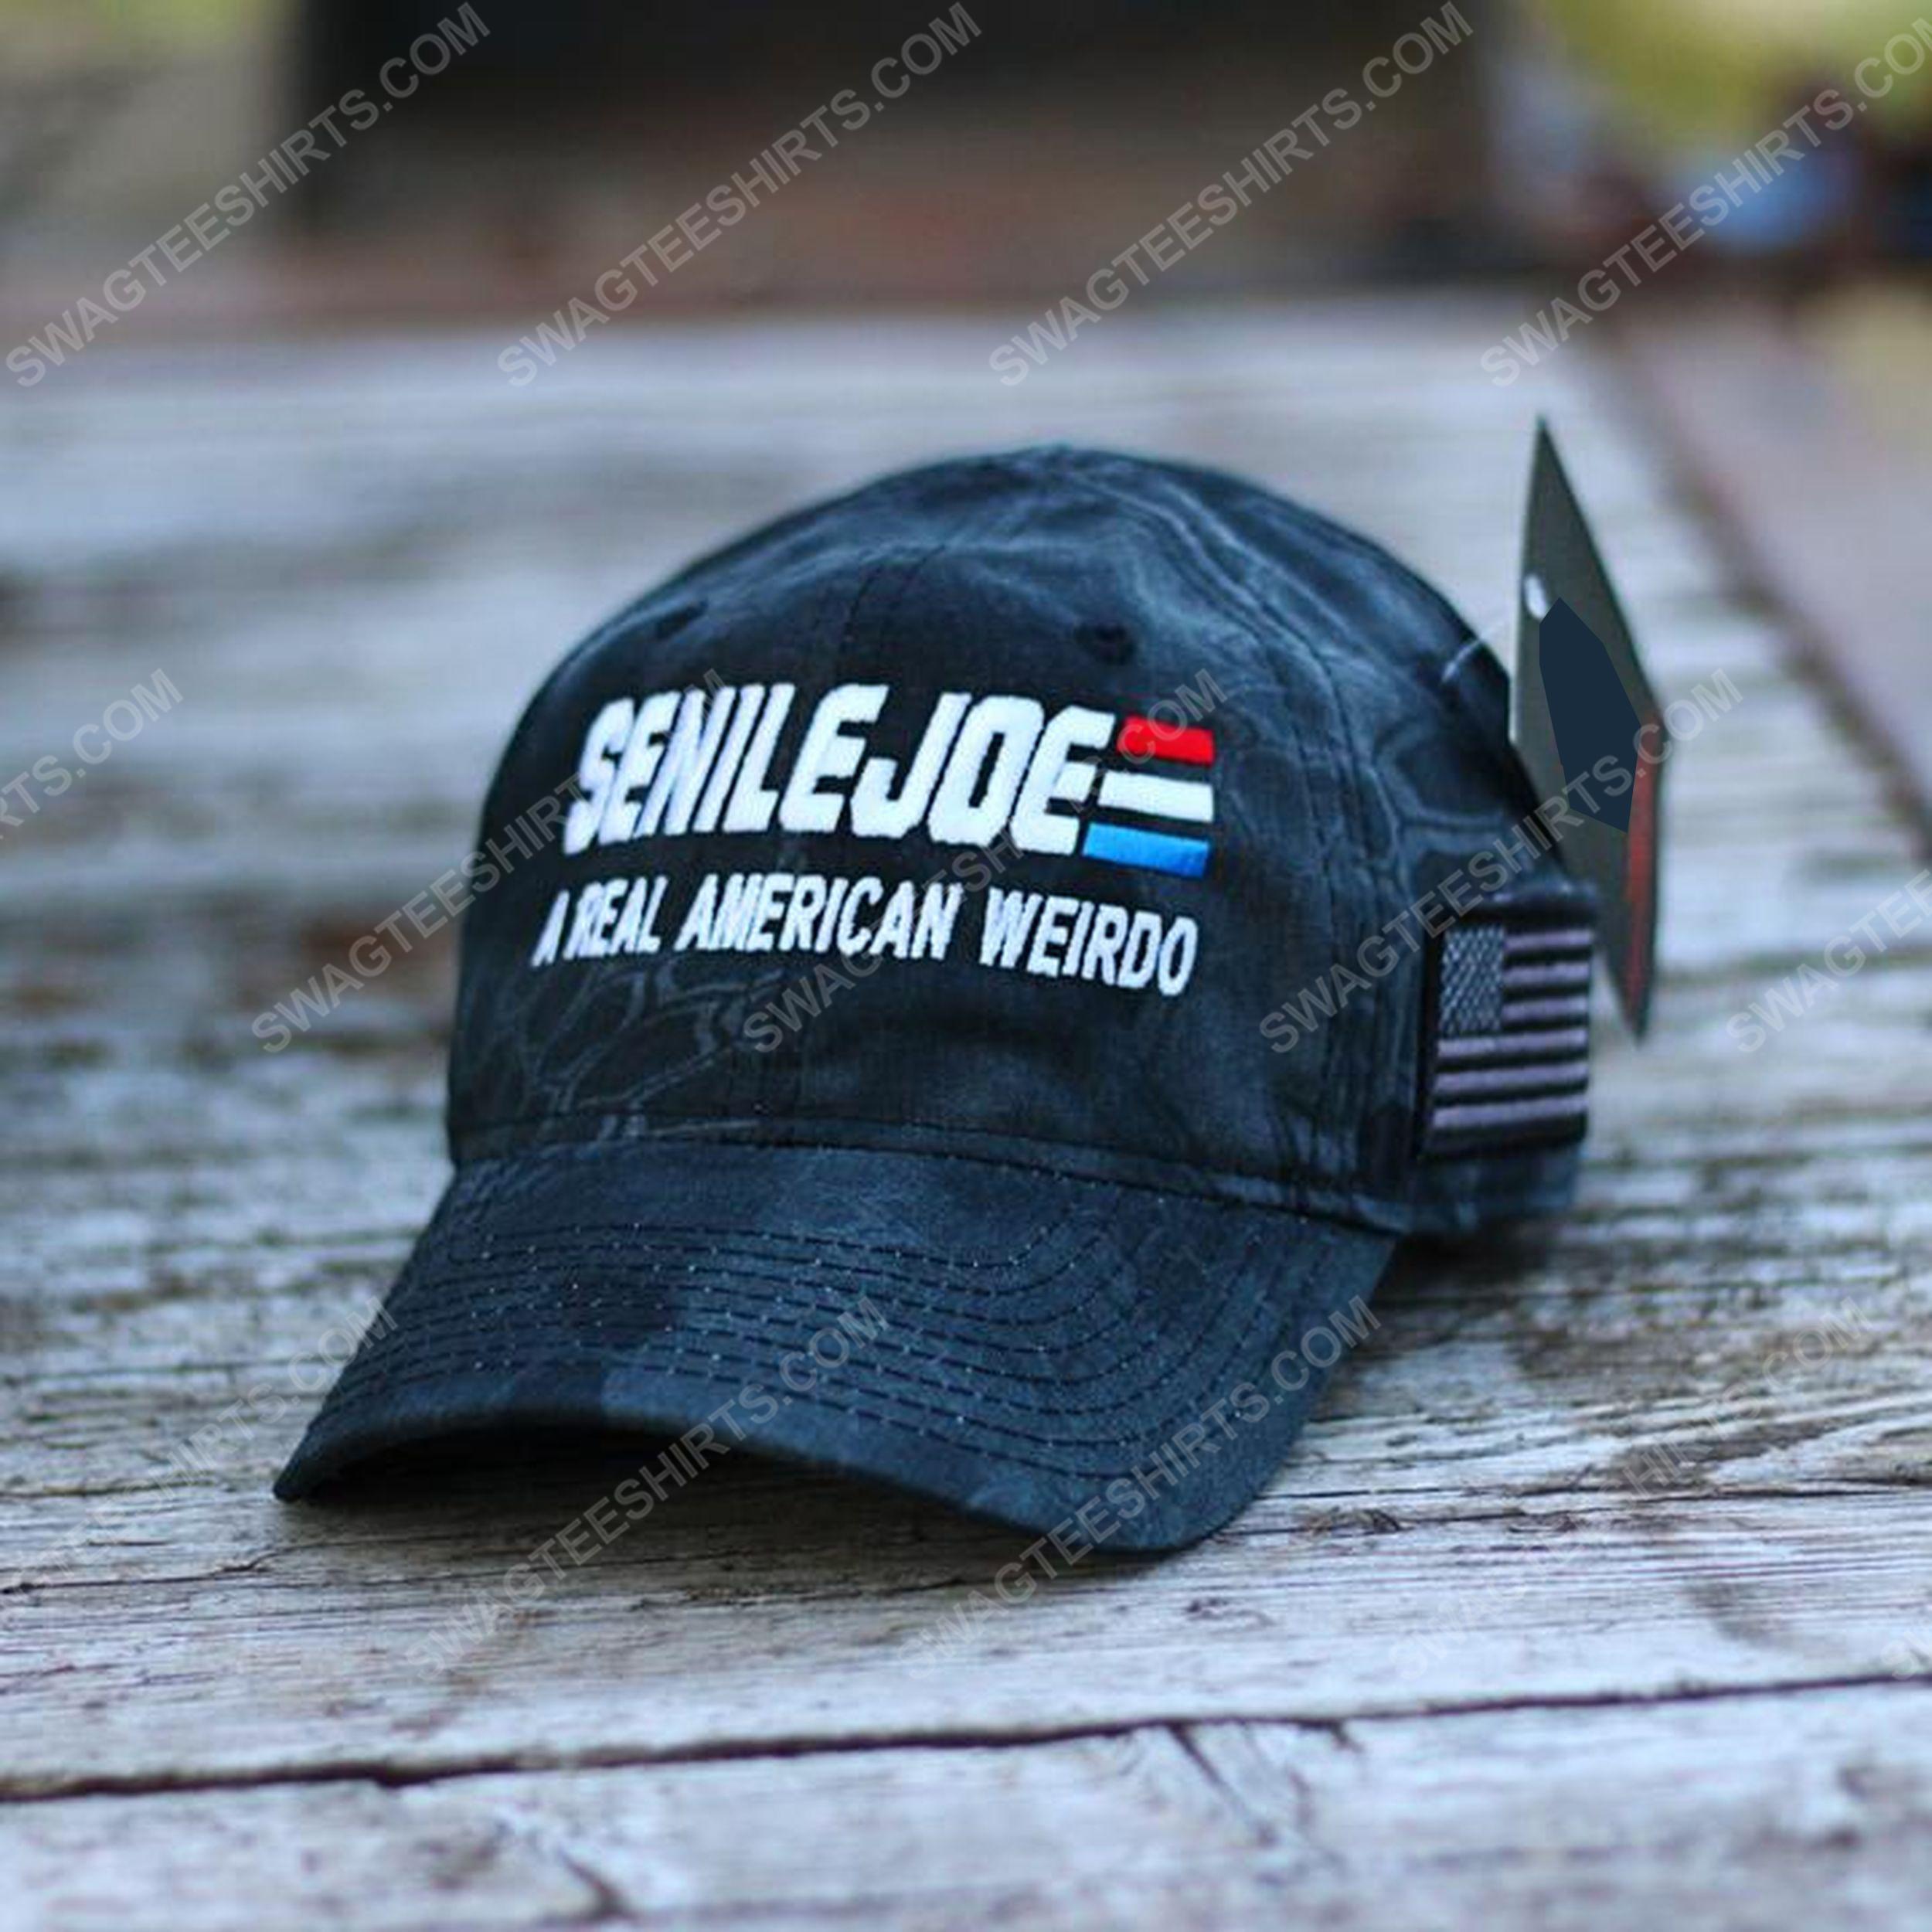 Senile joe a real american weirdo full print classic hat 1 - Copy